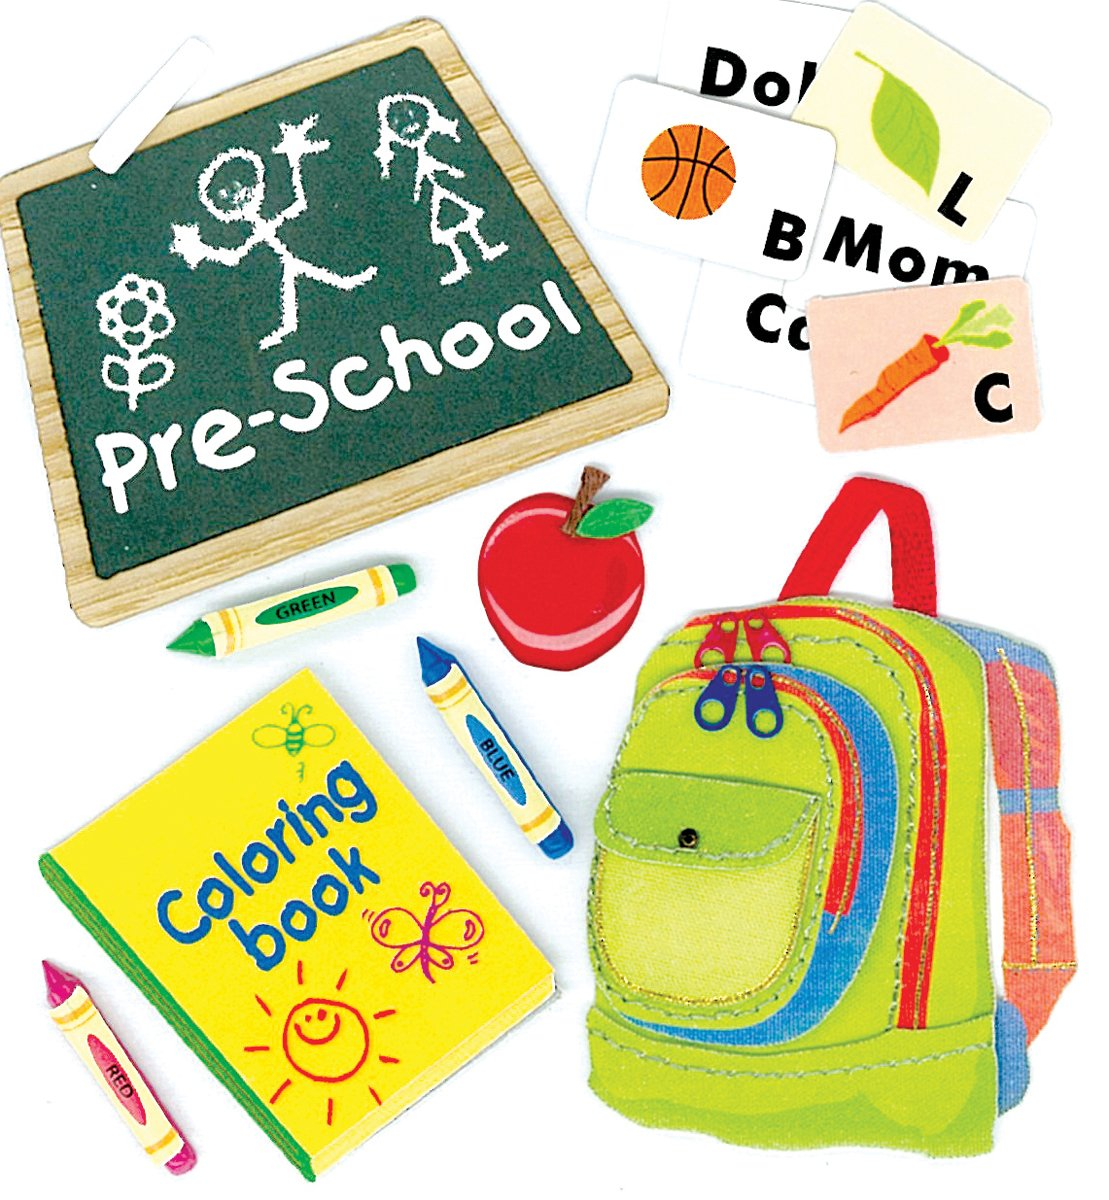 Jolee's Boutique Dimensional Stickers - Preschool